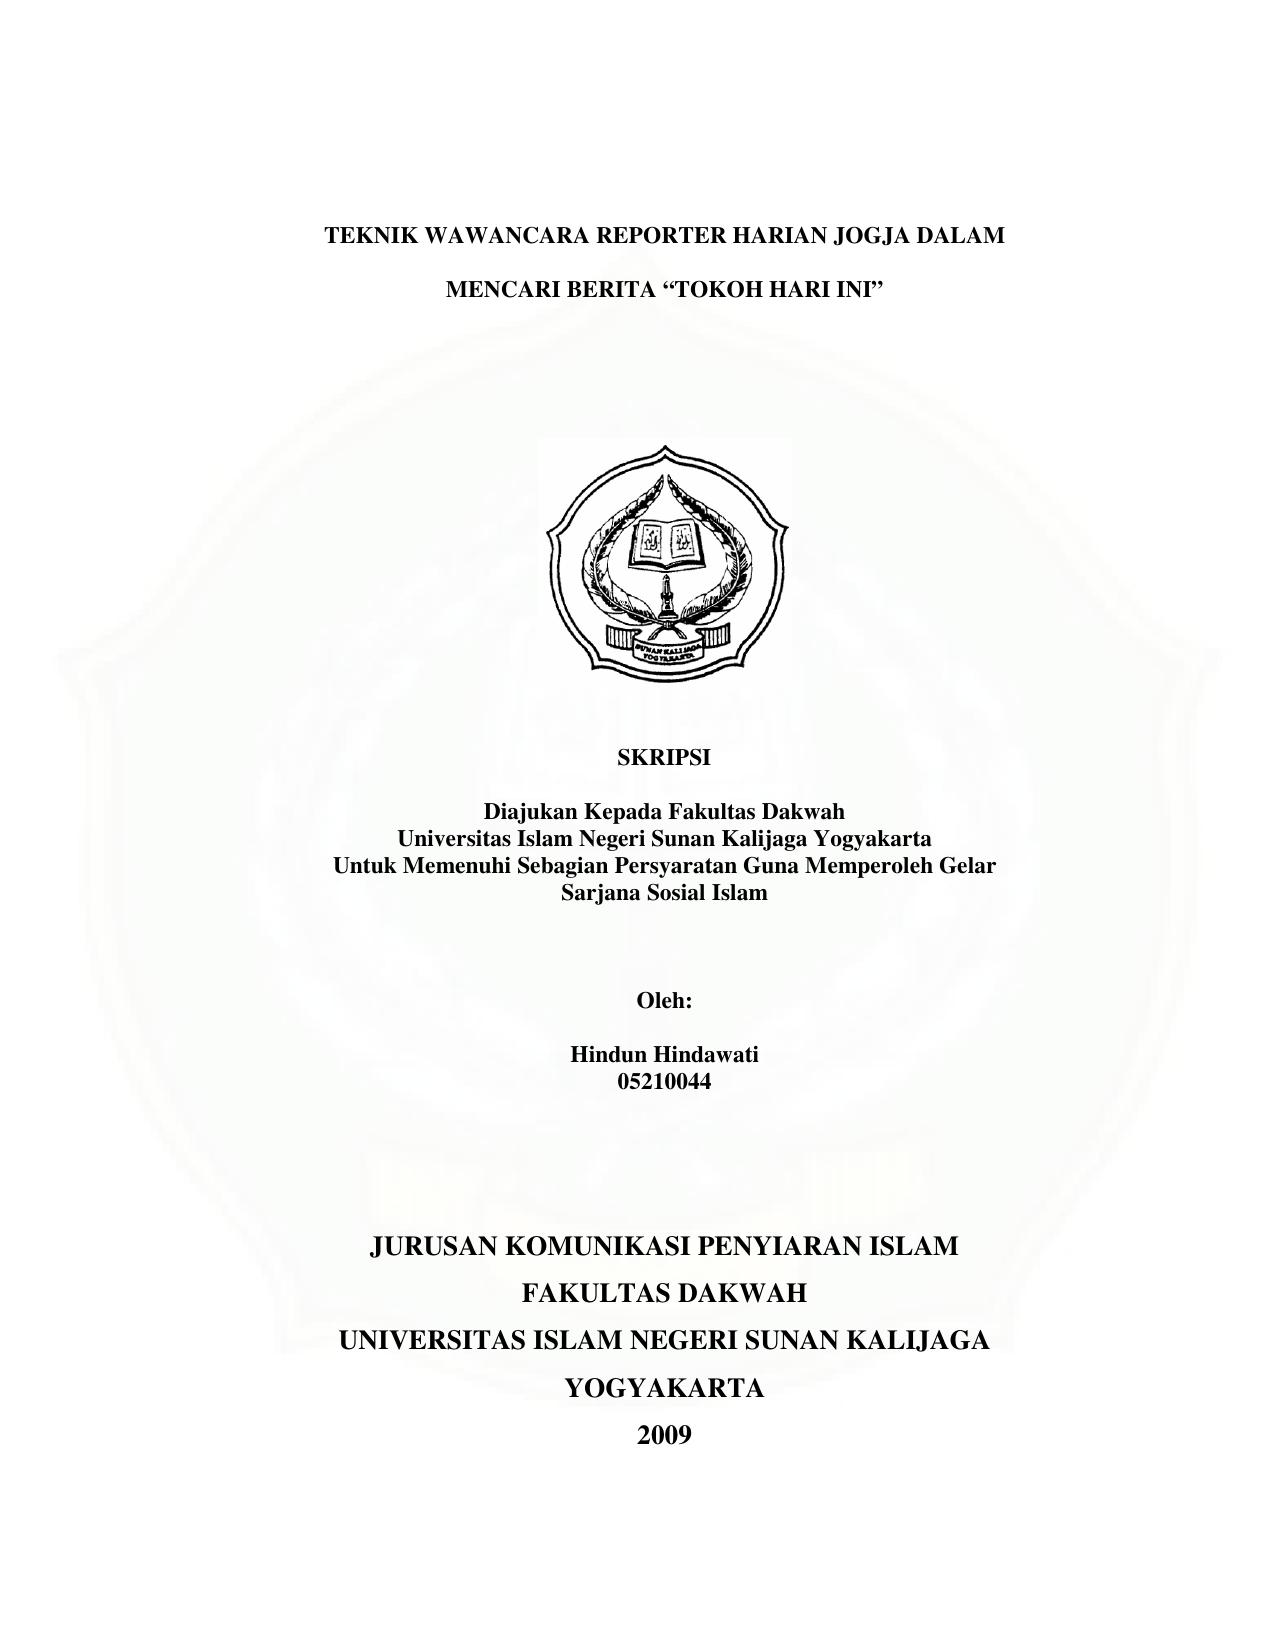 Jurusan Komunikasi Penyiaran Islam Fakultas Dakwah Universitas